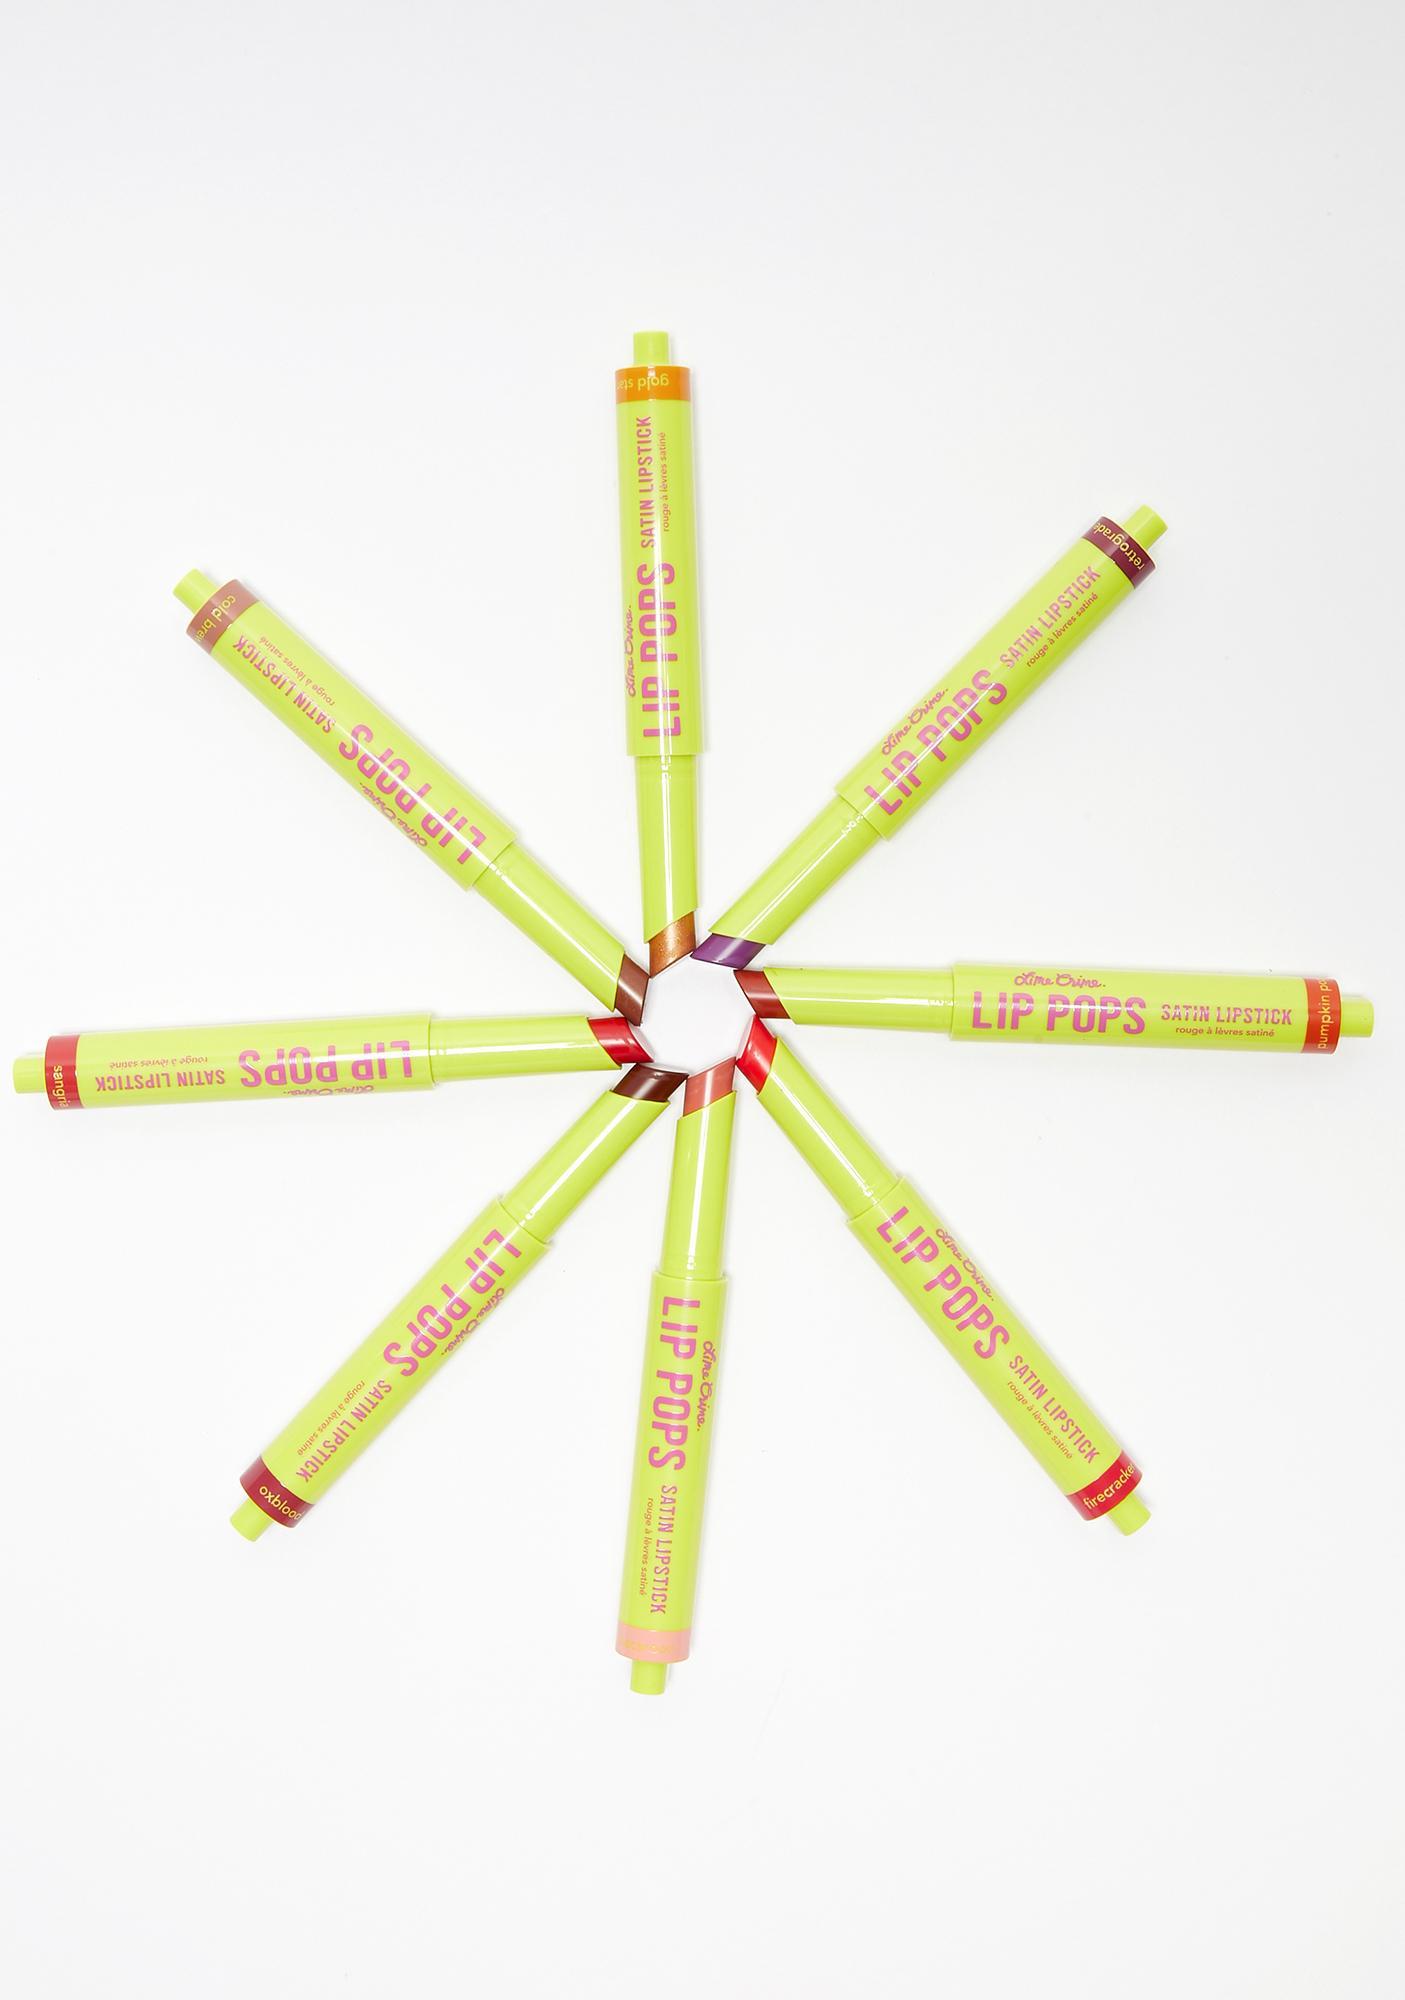 Lime Crime Macaroon Lip Pops Satin Lipstick